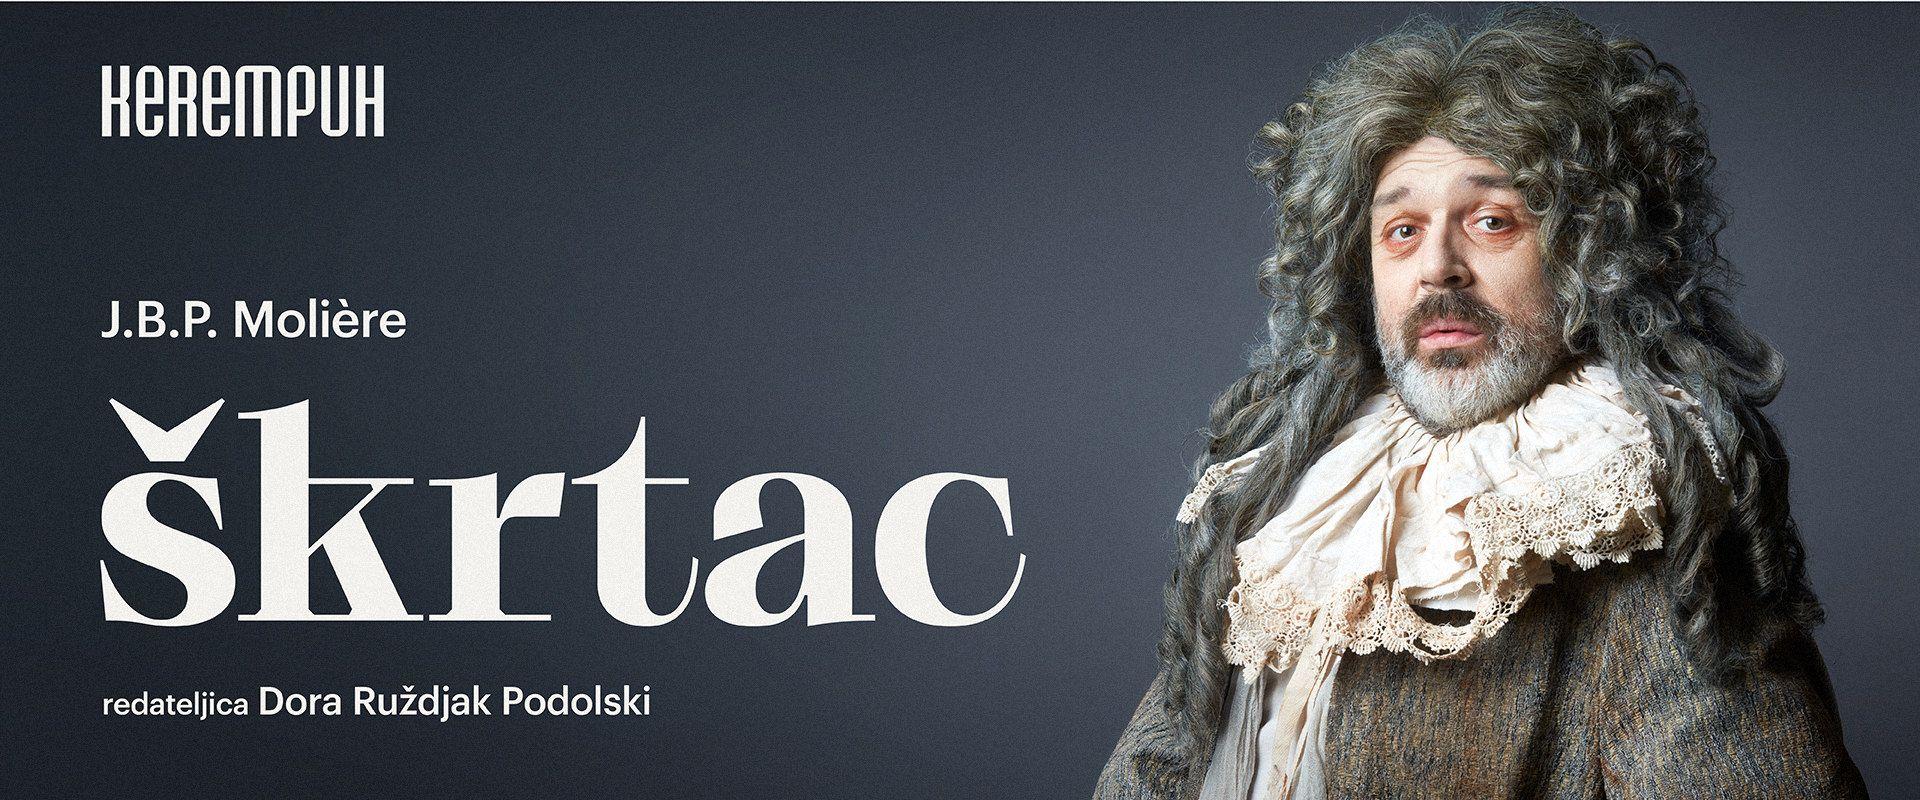 Premijera predstave 'Škrtac' J.B.P. Molièrea u Kerempuhu